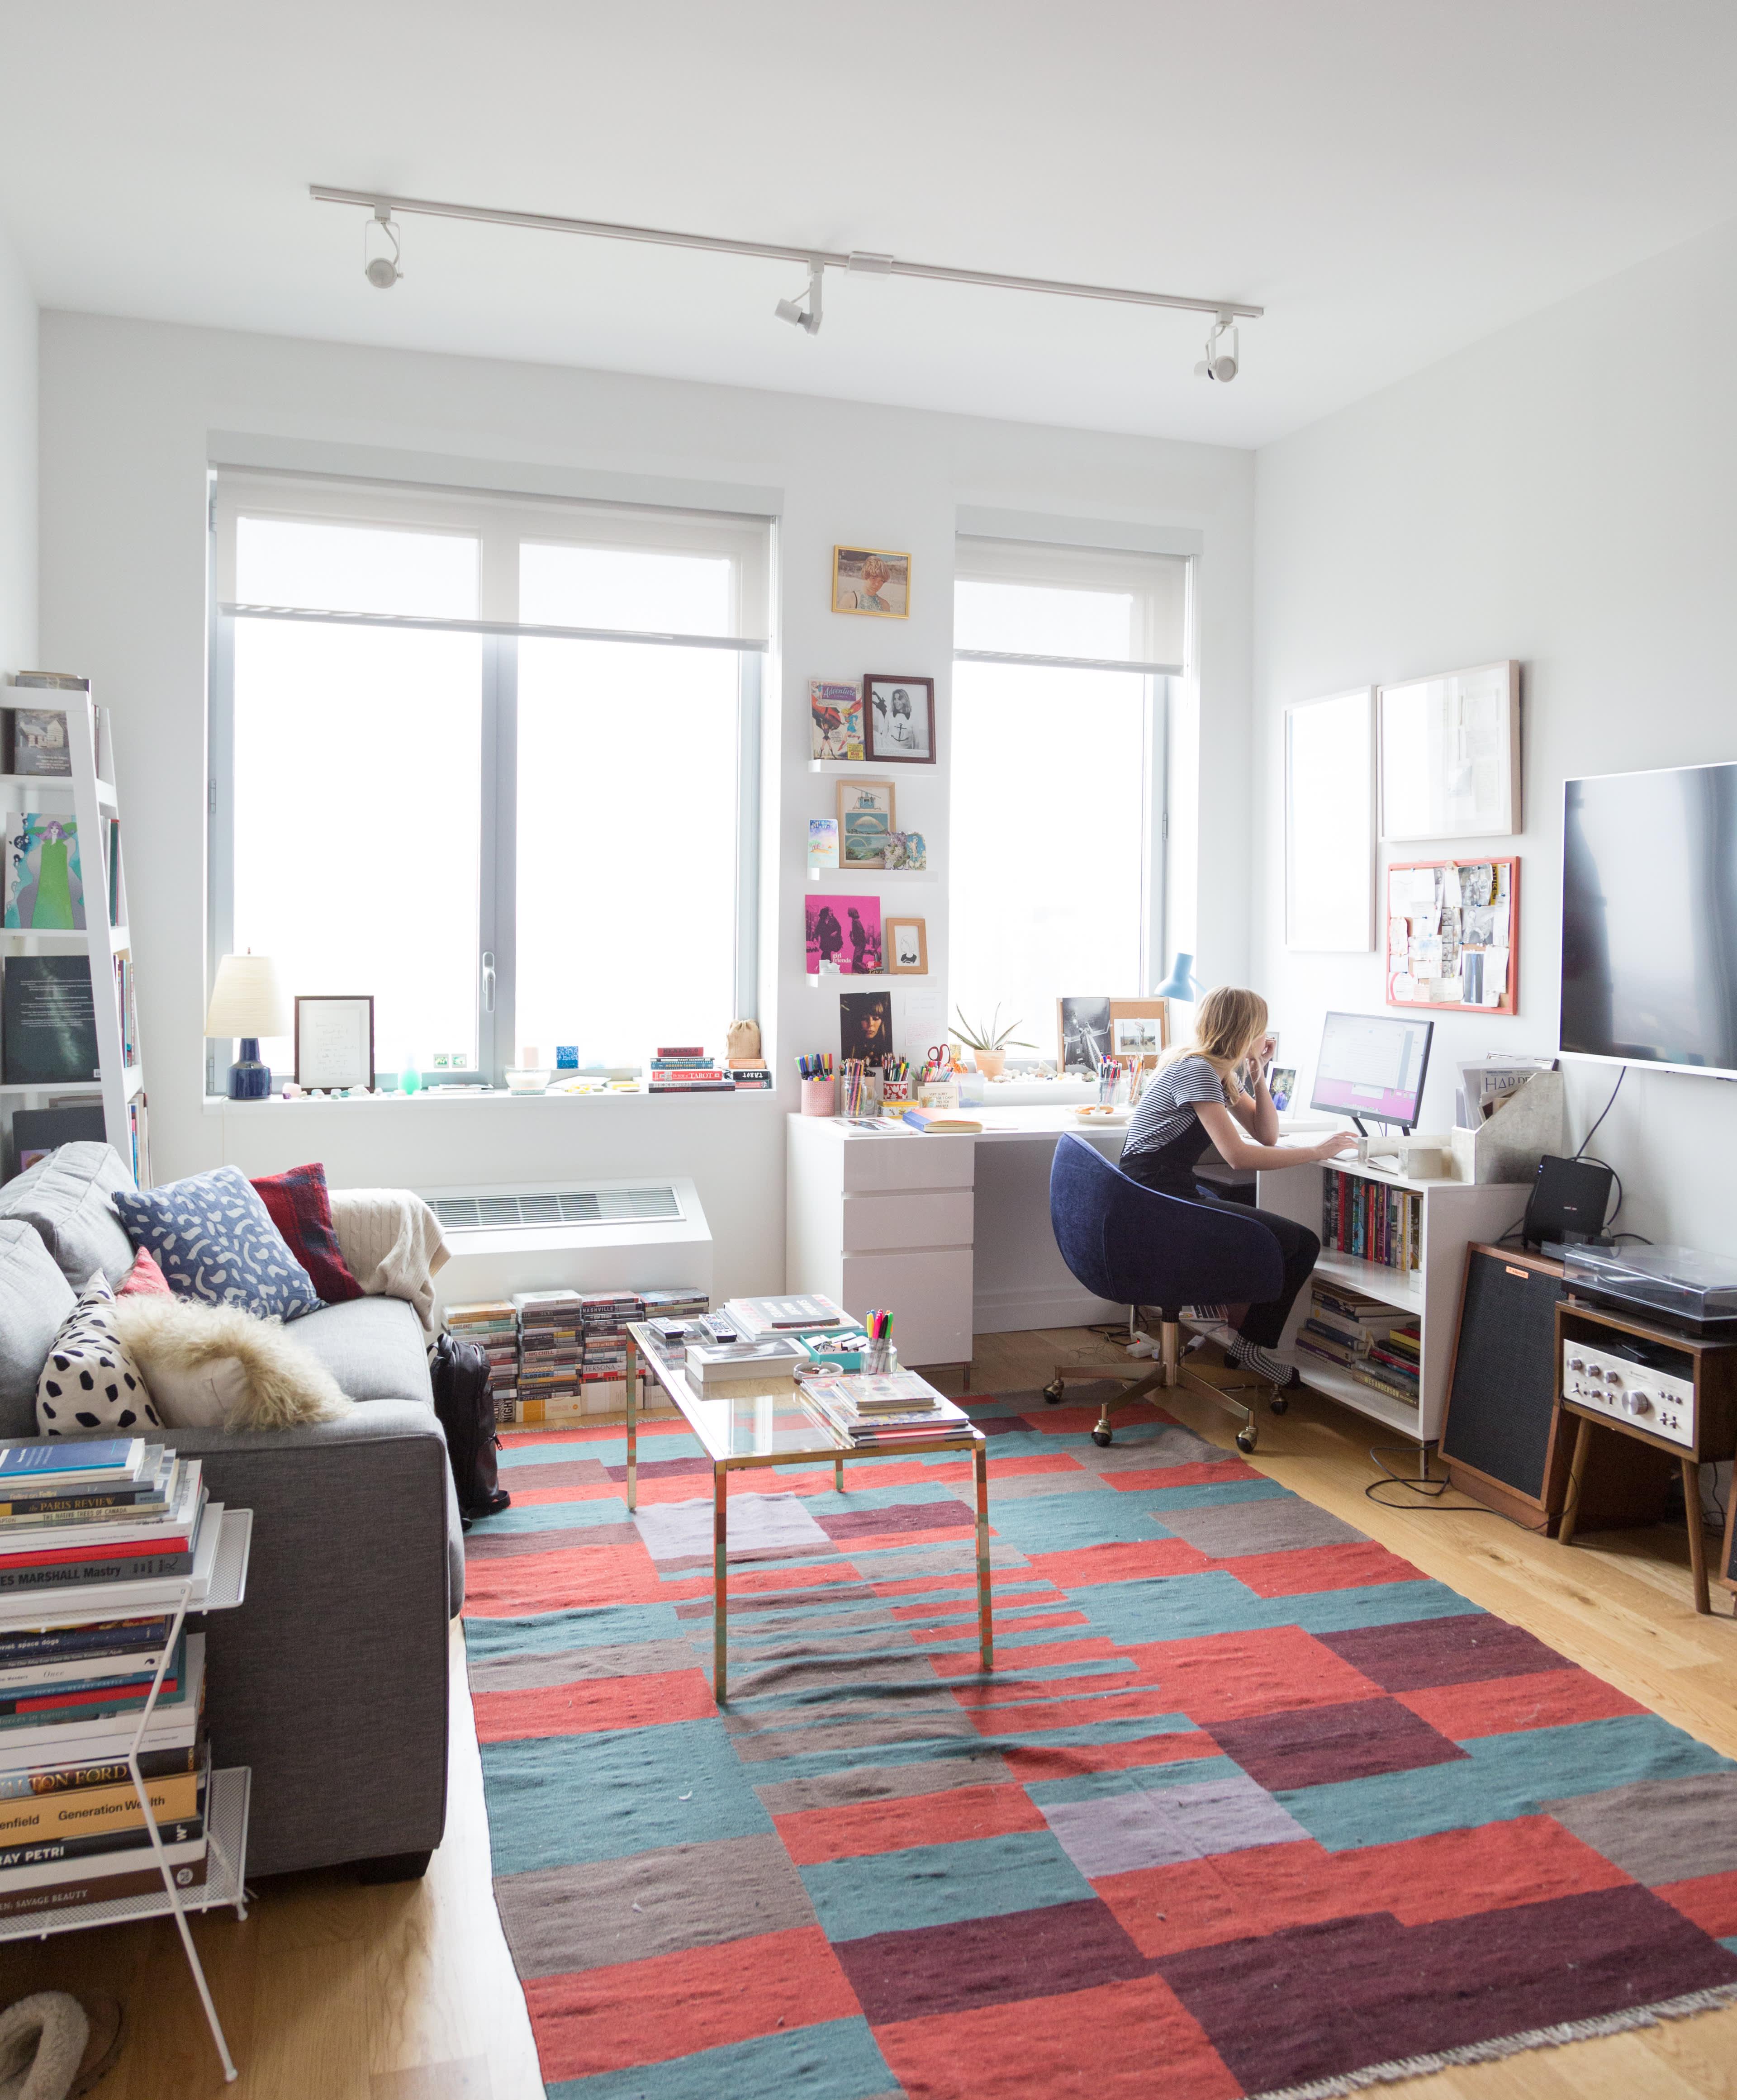 Tavi Gevinson Brooklyn Apartment Design Photo Tour